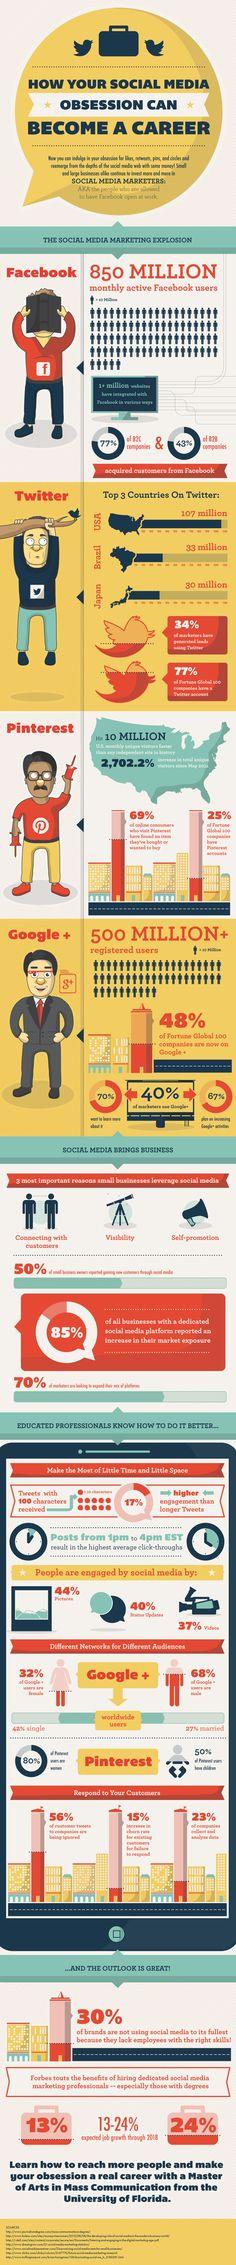 Amazing Social Media Statistics From Facebook, Twitter, Pinterest And Google+ [INFOGRAPHIC] - AllTwitter